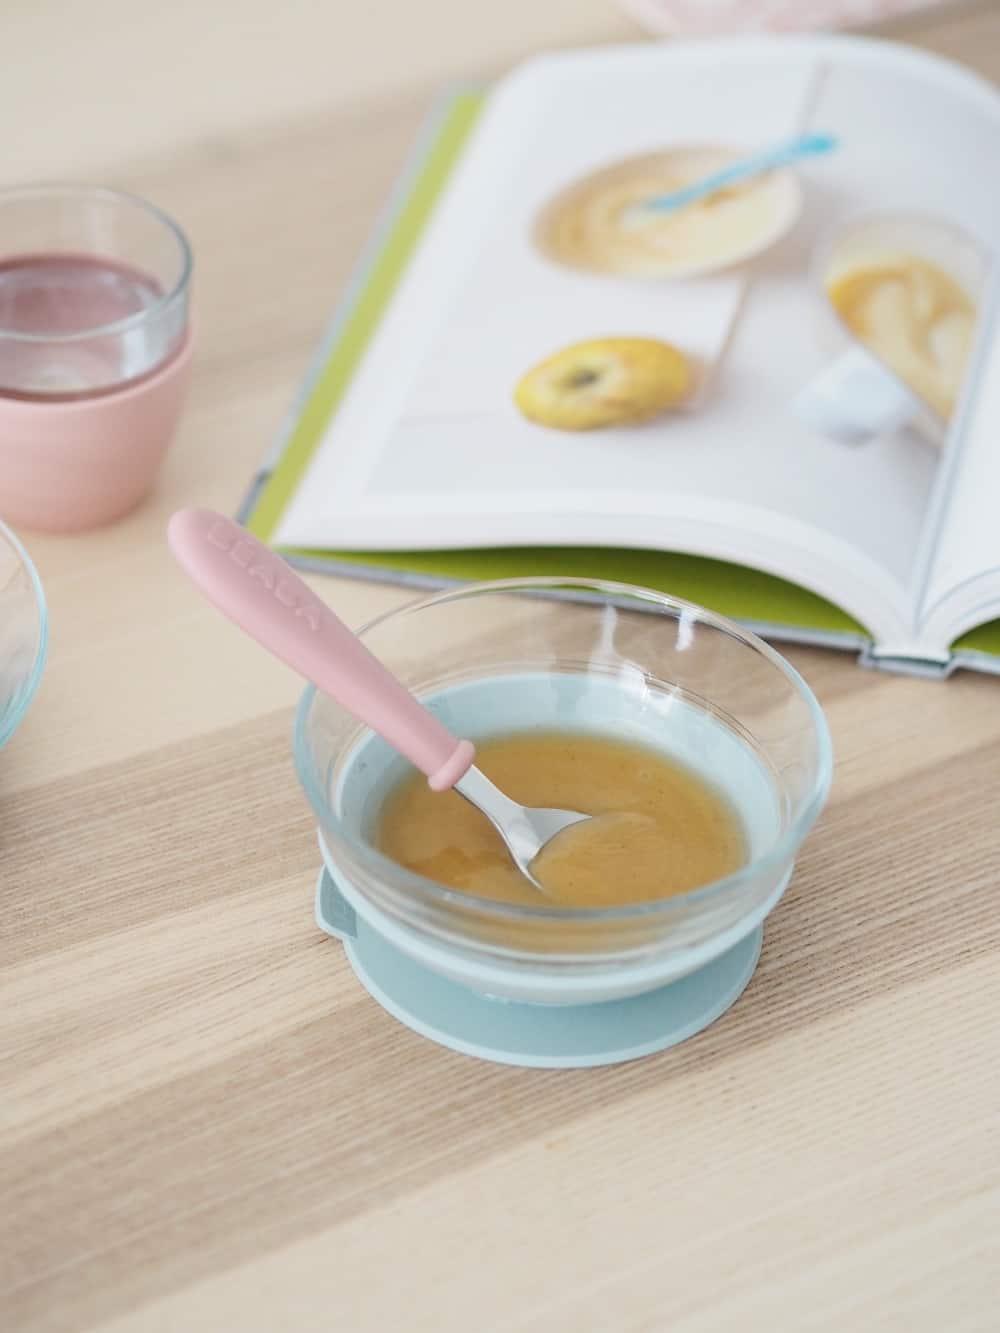 Beaba Glass Suction Meal Set with puree inside